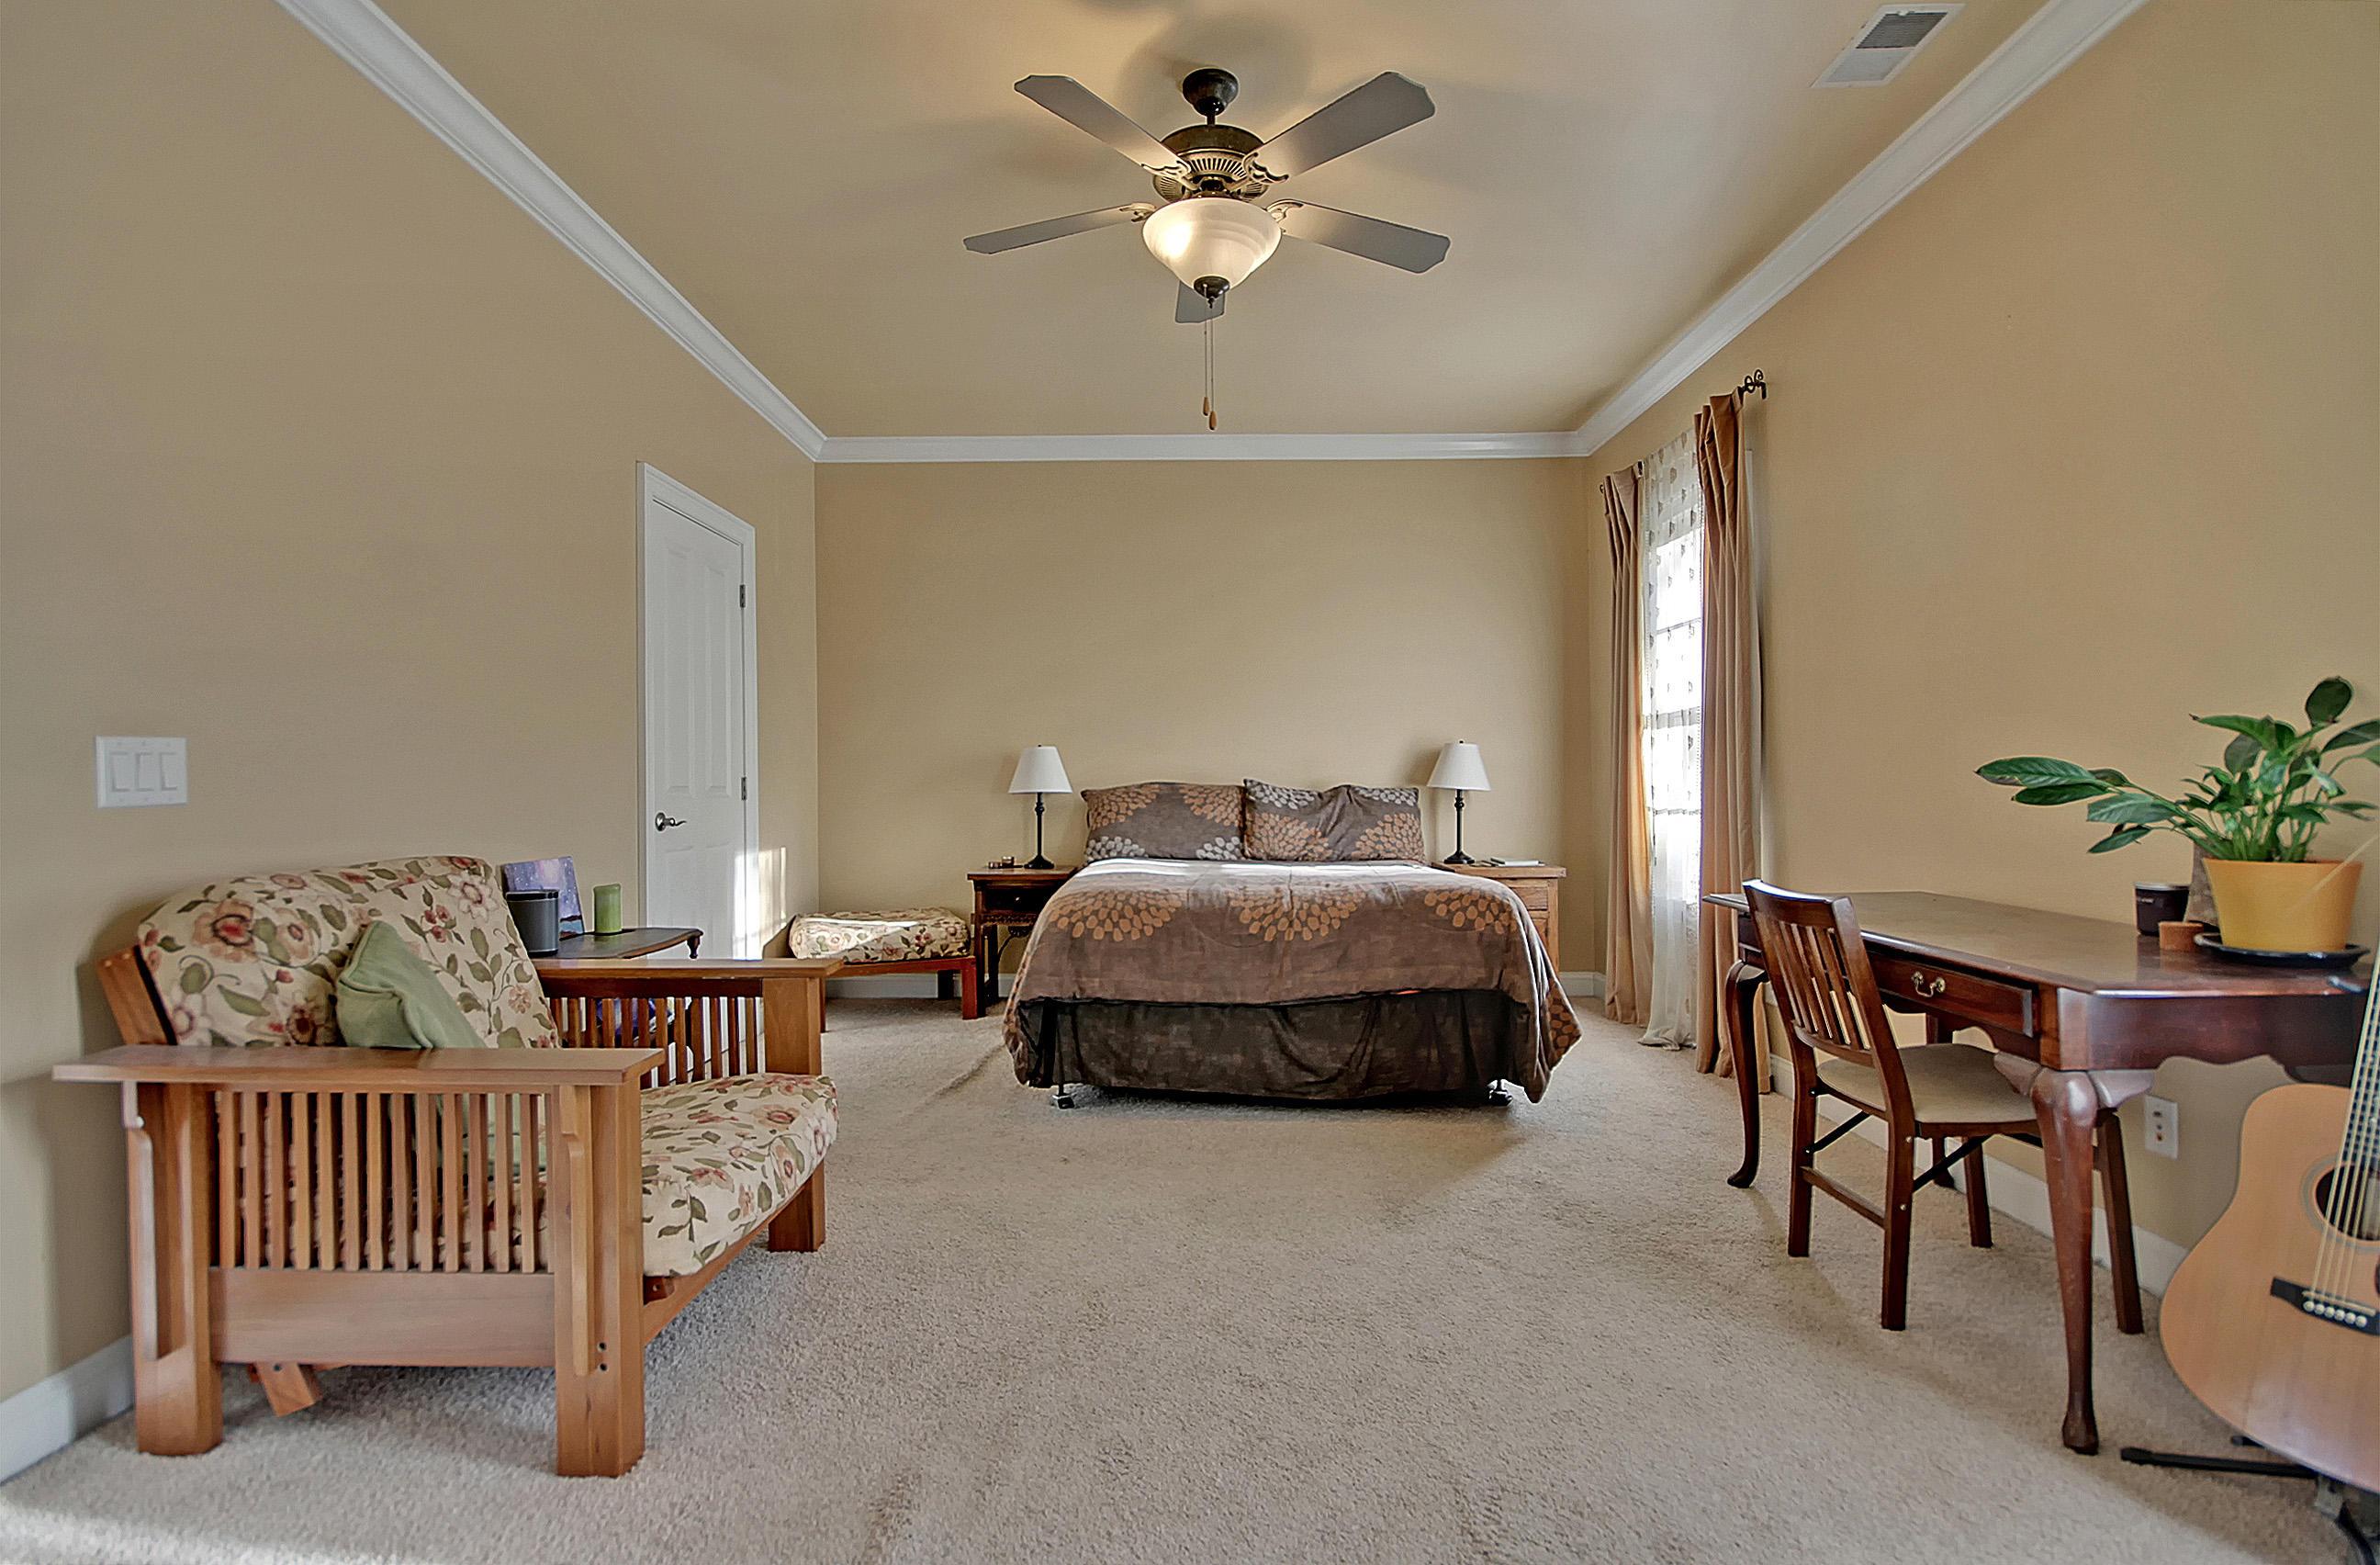 Cloudbreak Court Homes For Sale - 638 Cloudbreak, Charleston, SC - 11